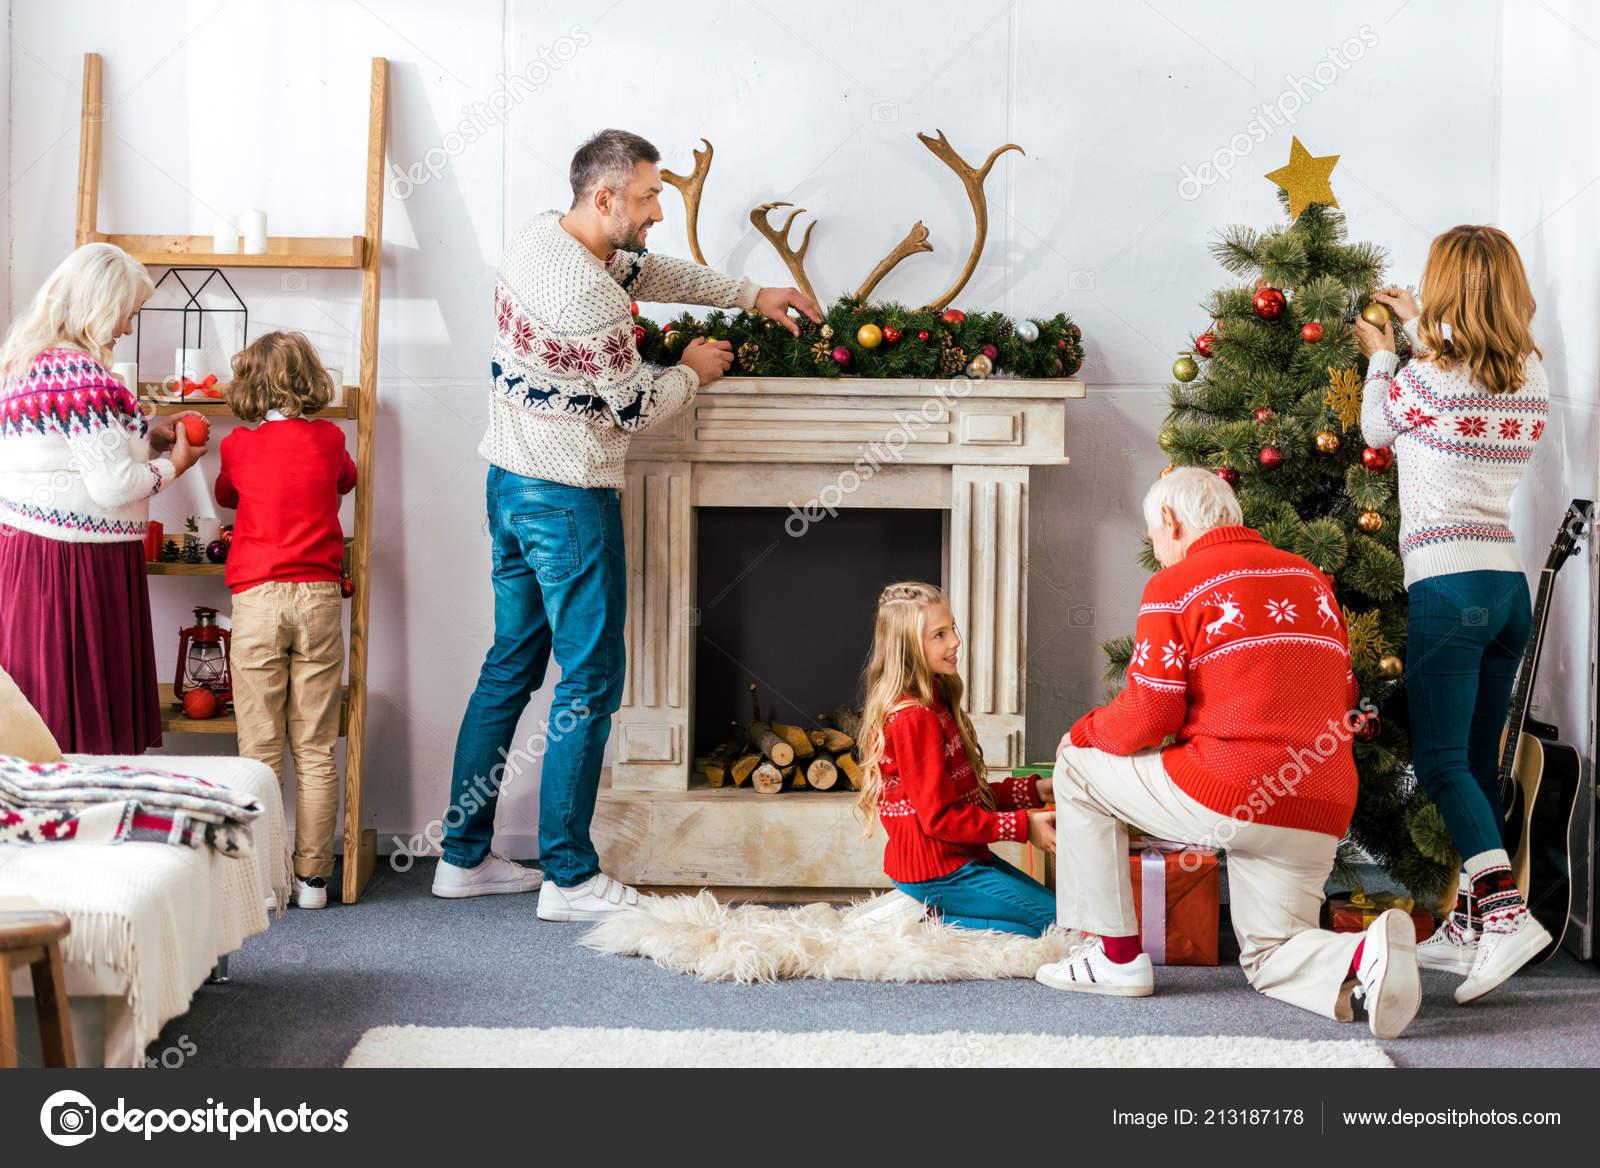 Big Family Decorating Living Room Christmas Together Stock